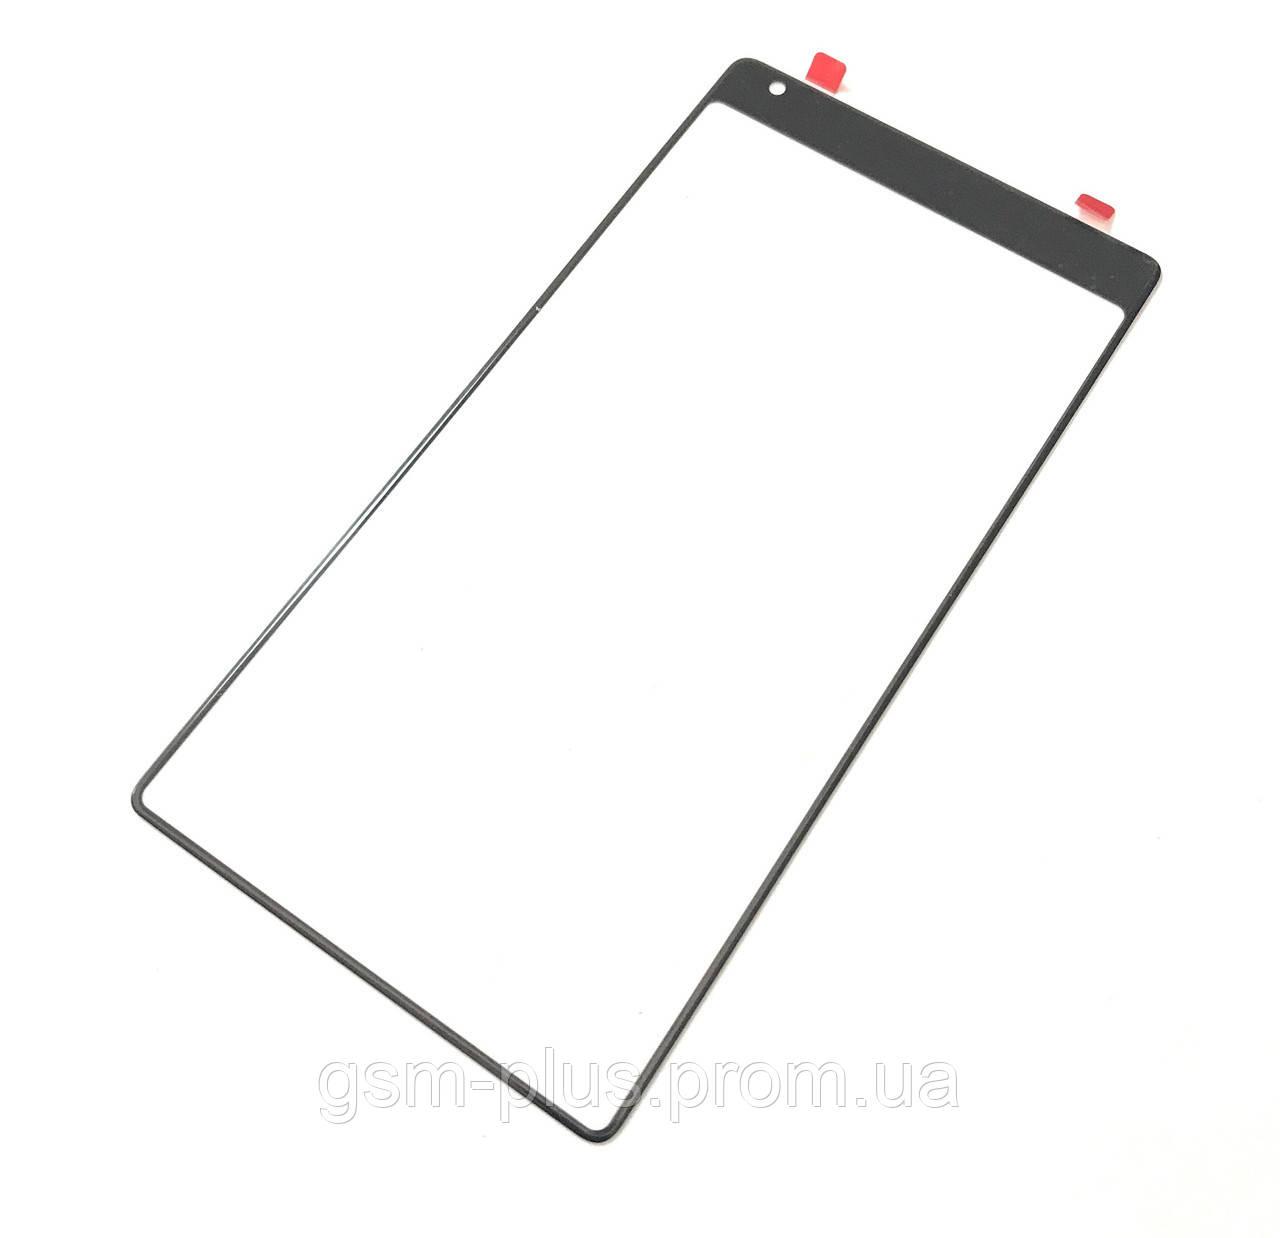 Стекло дисплея Xiaomi Mi Mix Black (для переклейки)